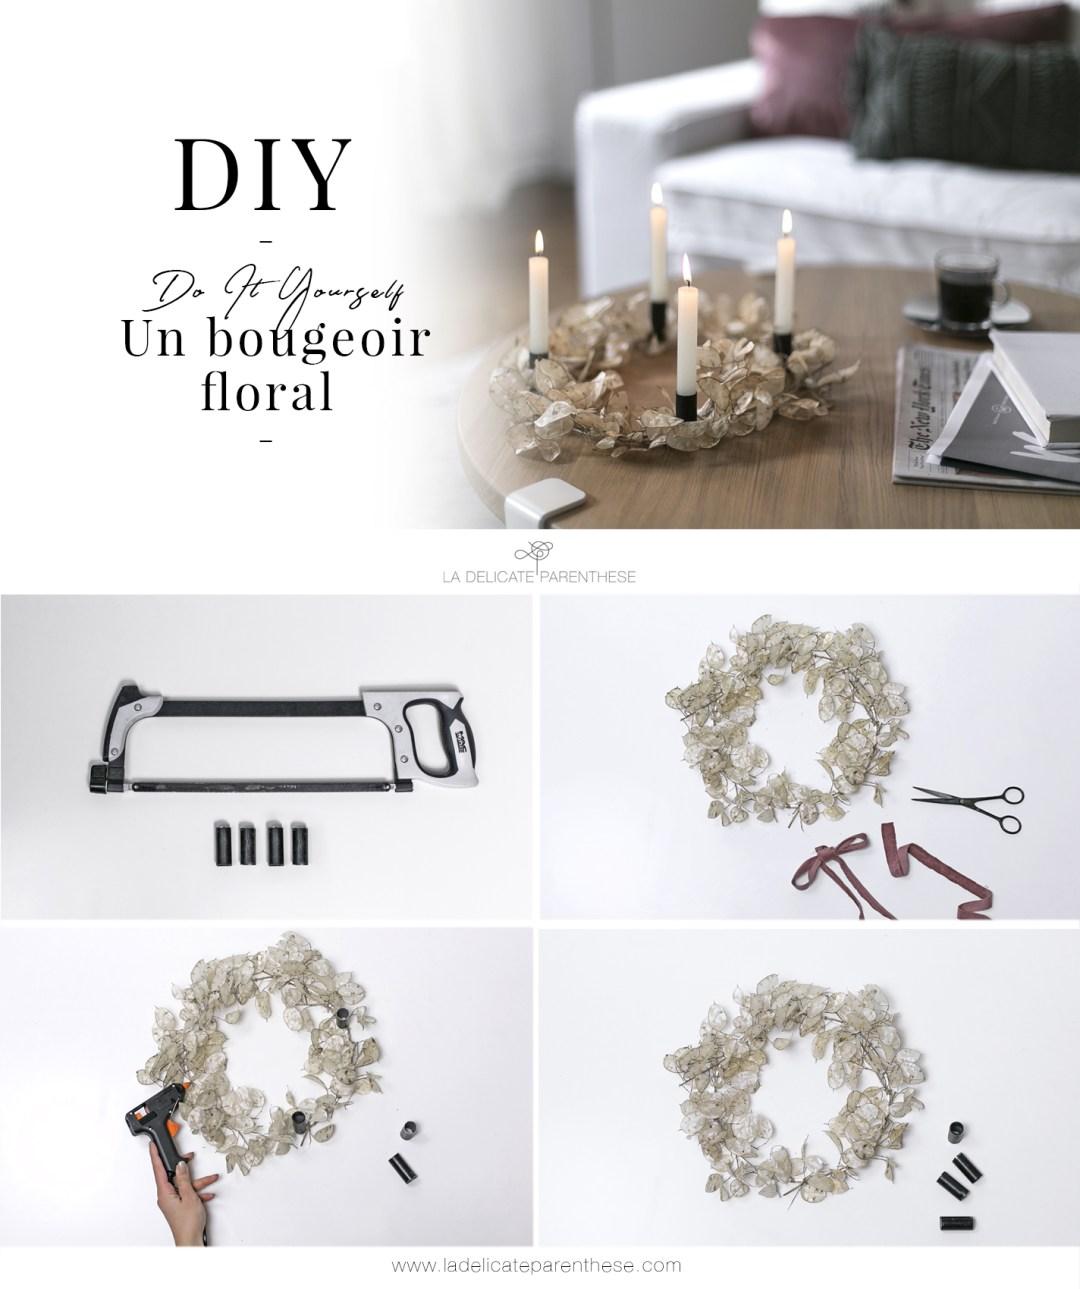 DIY handmade création interior design bougeoir